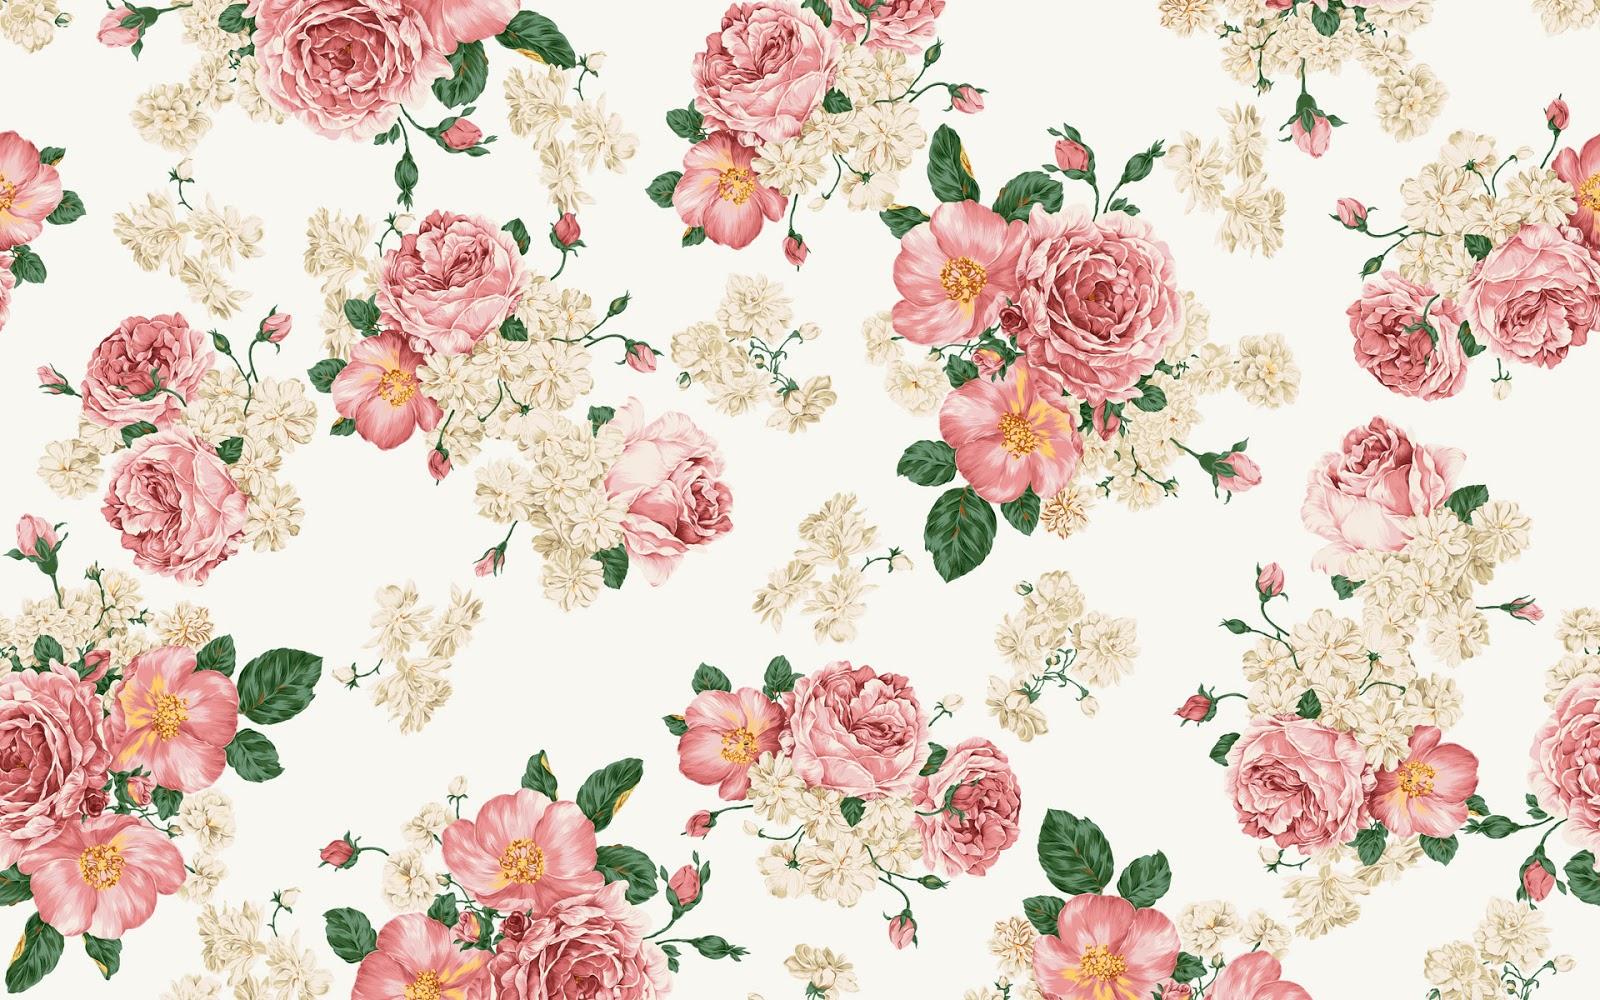 Vintage flower wallpaper - beautiful desktop wallpapers 2014